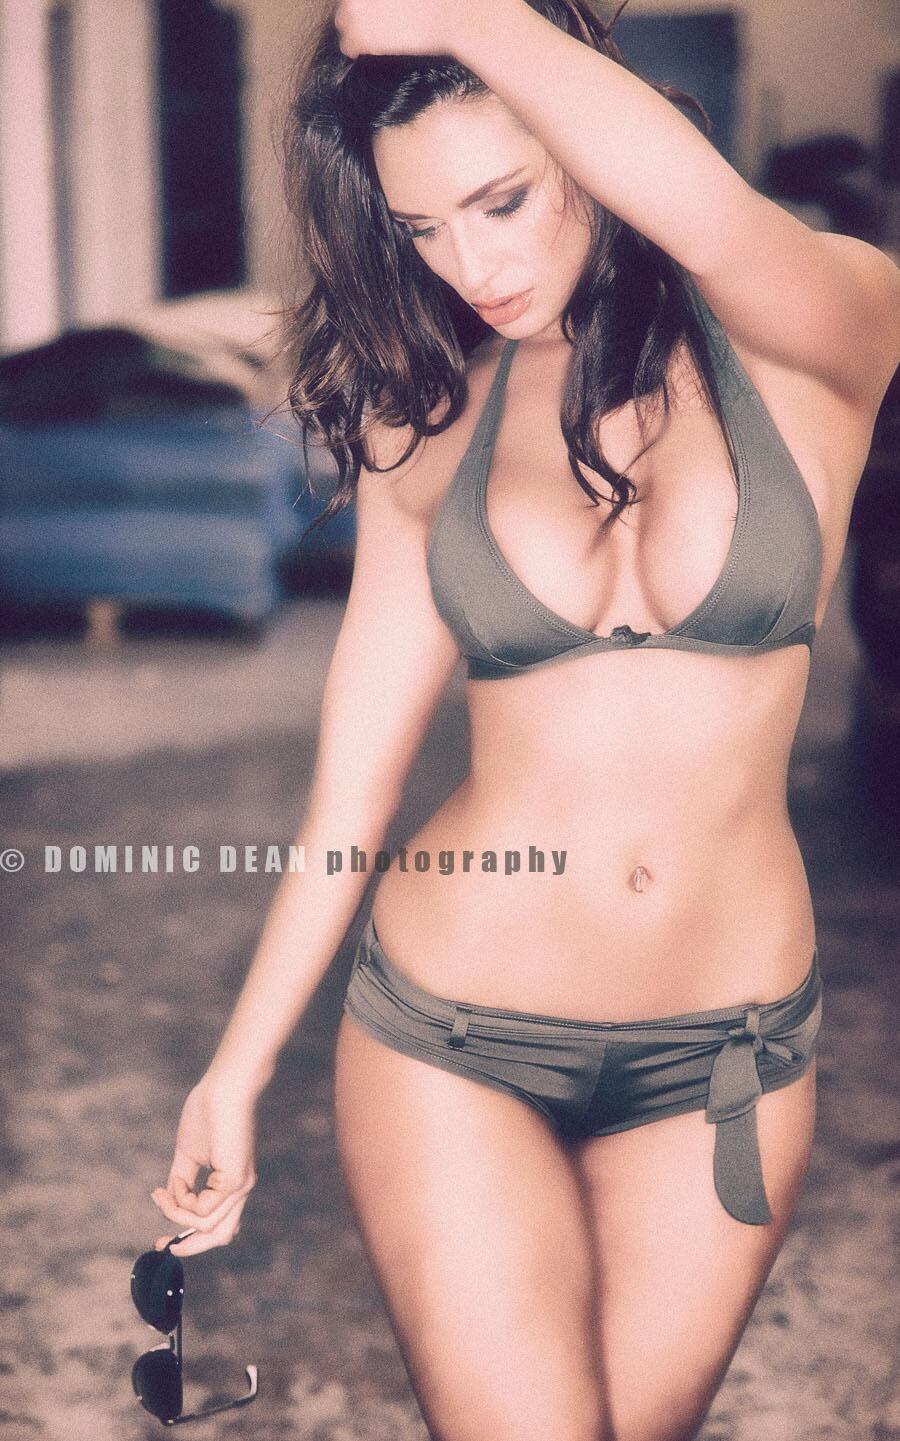 ICloud Juliana Reis nudes (67 foto and video), Ass, Bikini, Instagram, cleavage 2018